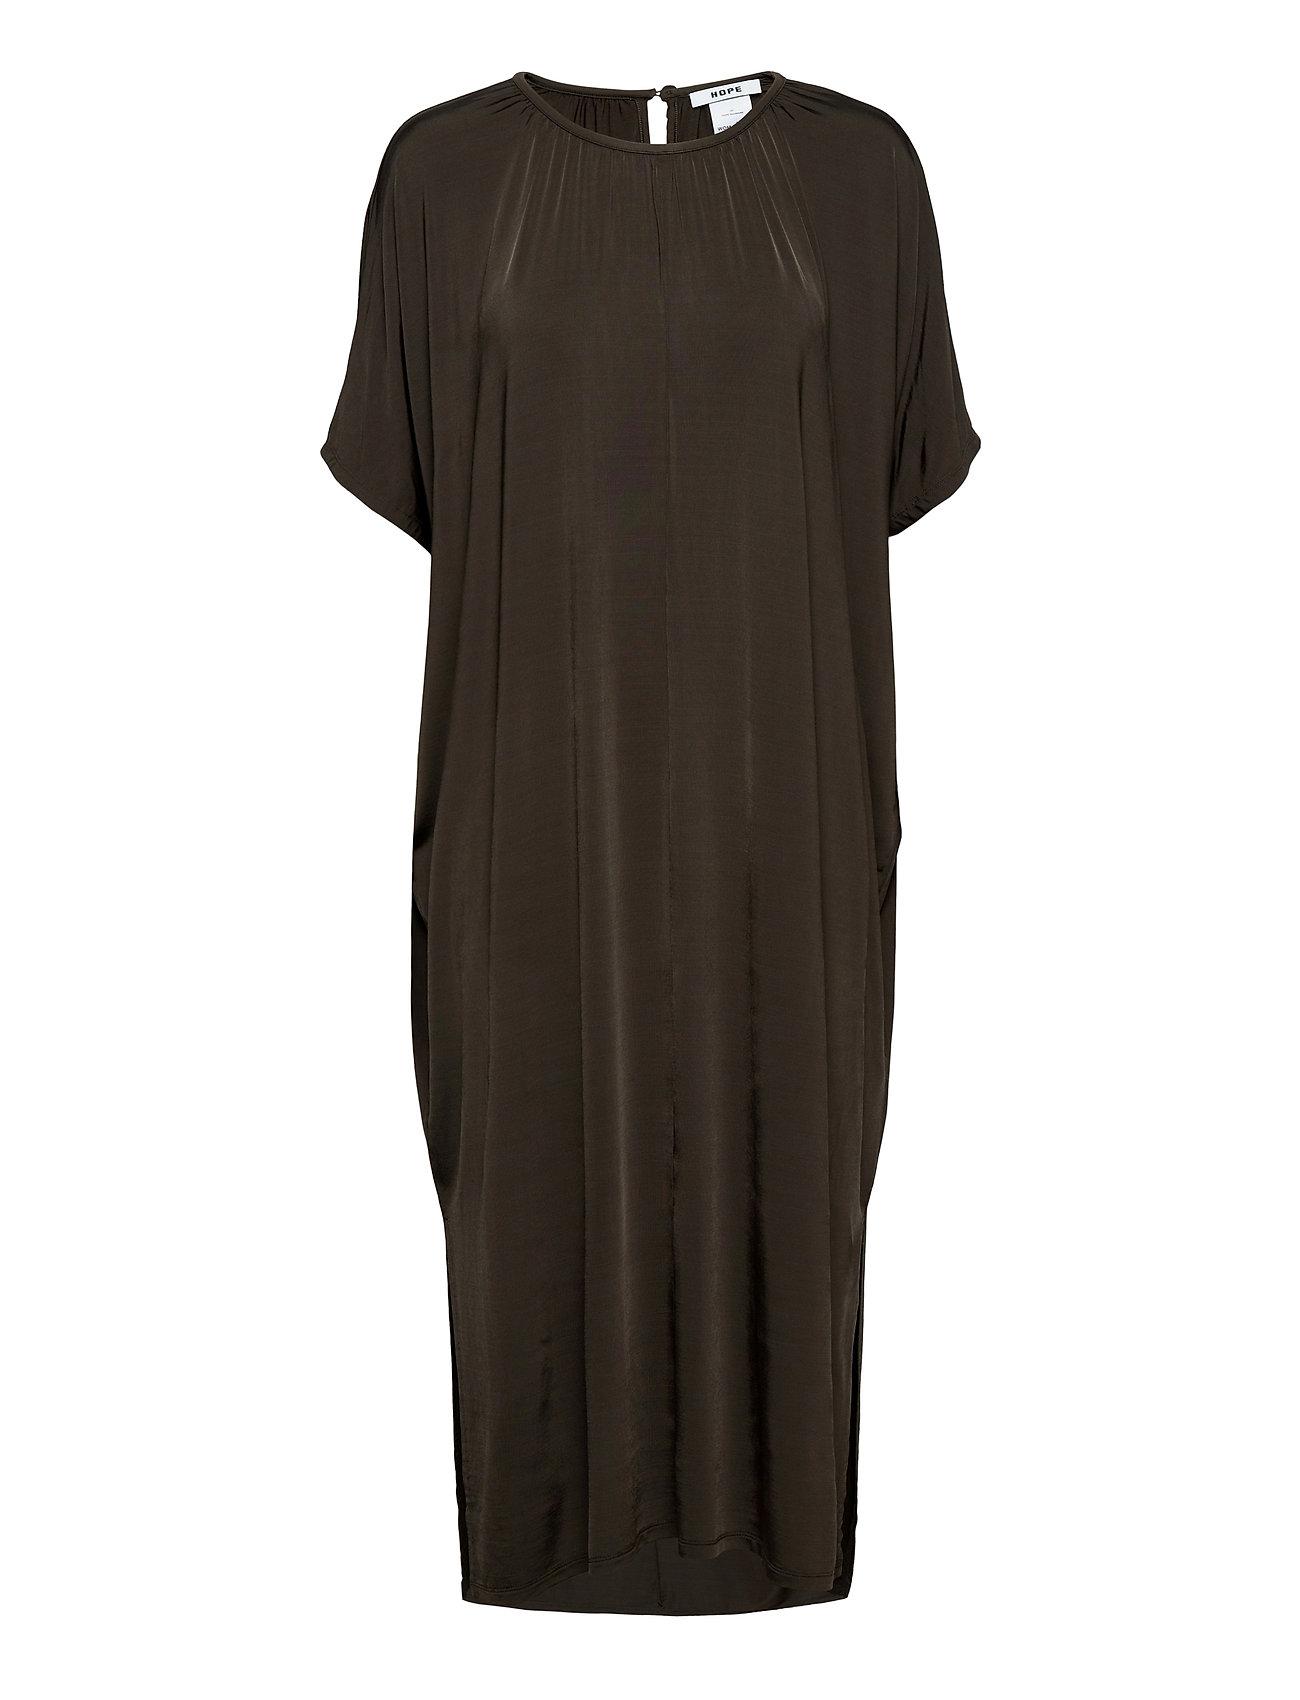 Image of Sense Dress Maxikjole Festkjole Sort Hope (3447243263)